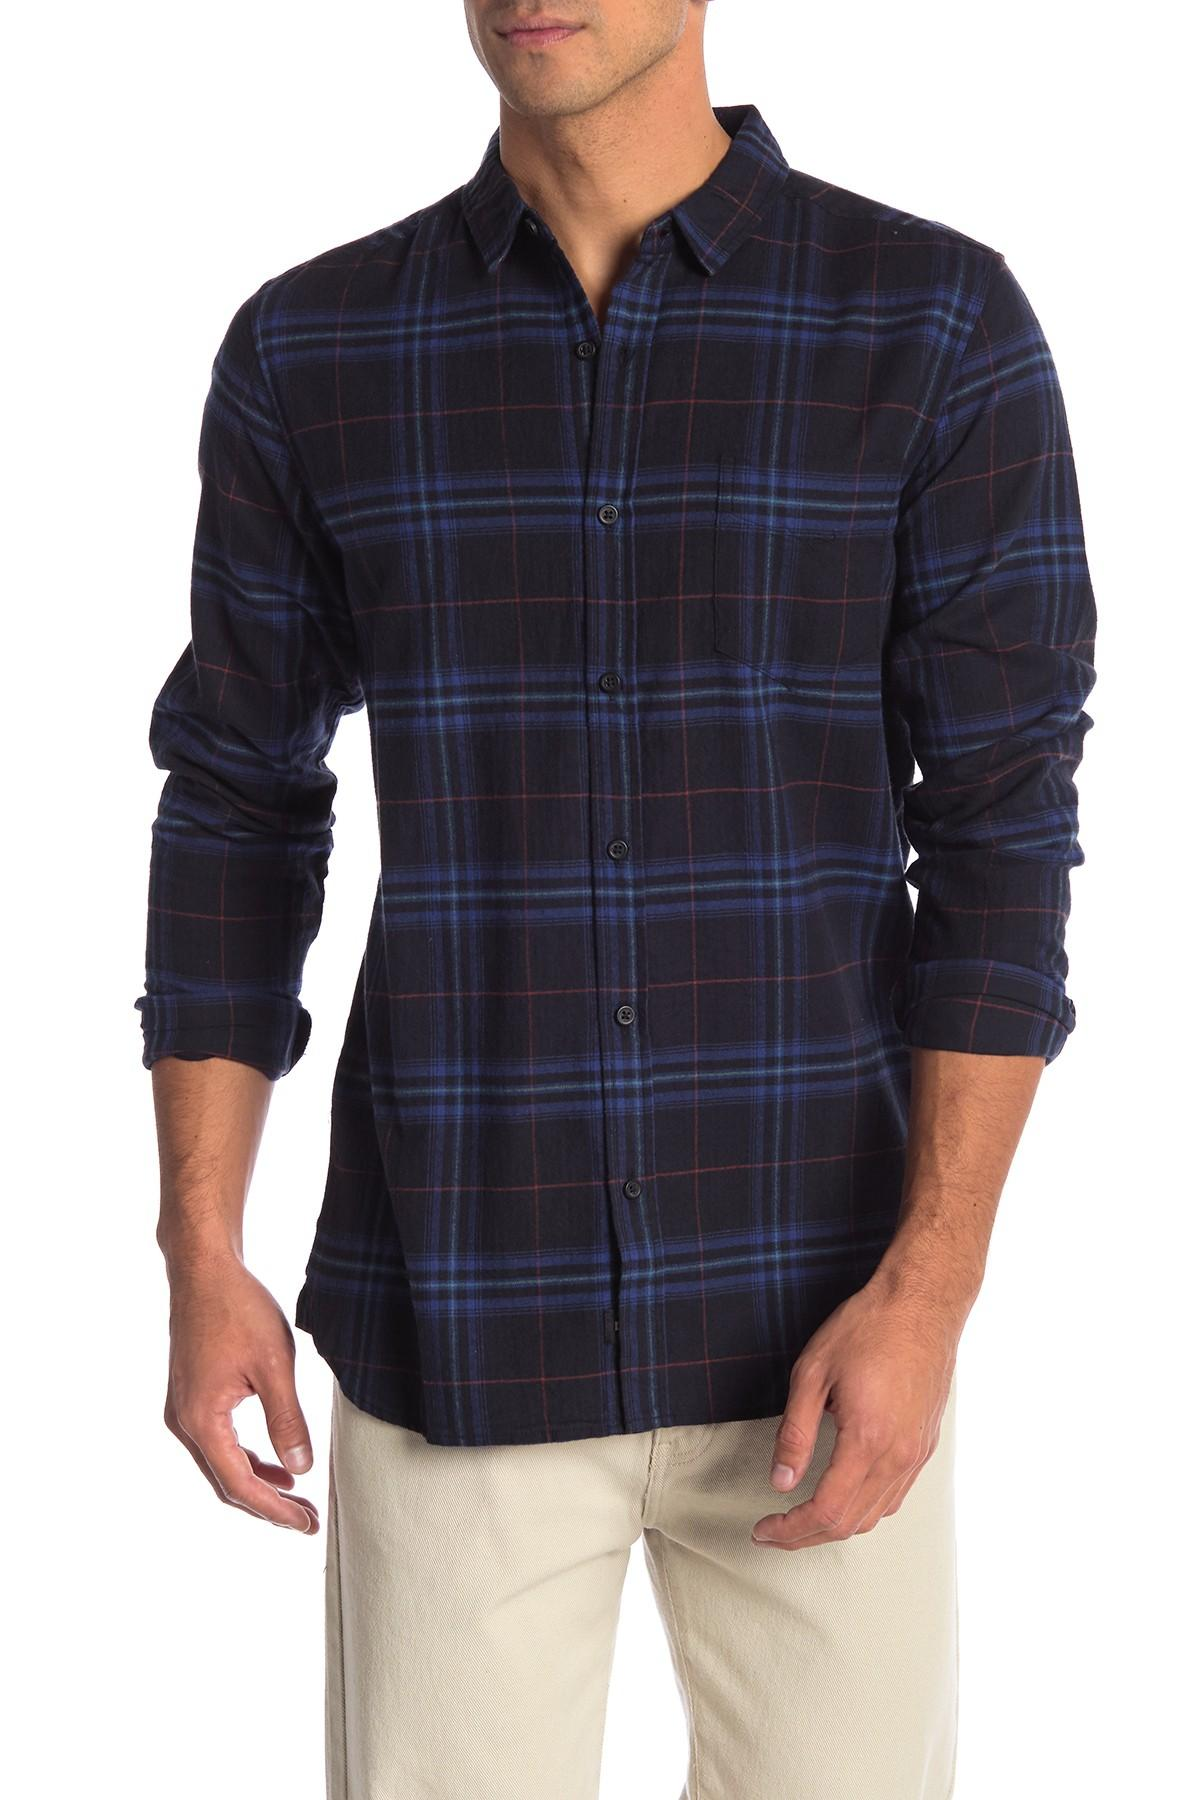 f82376b4bc5b Lyst - Globe Dock Plaid Shirt in Blue for Men - Save 37.77777777777778%